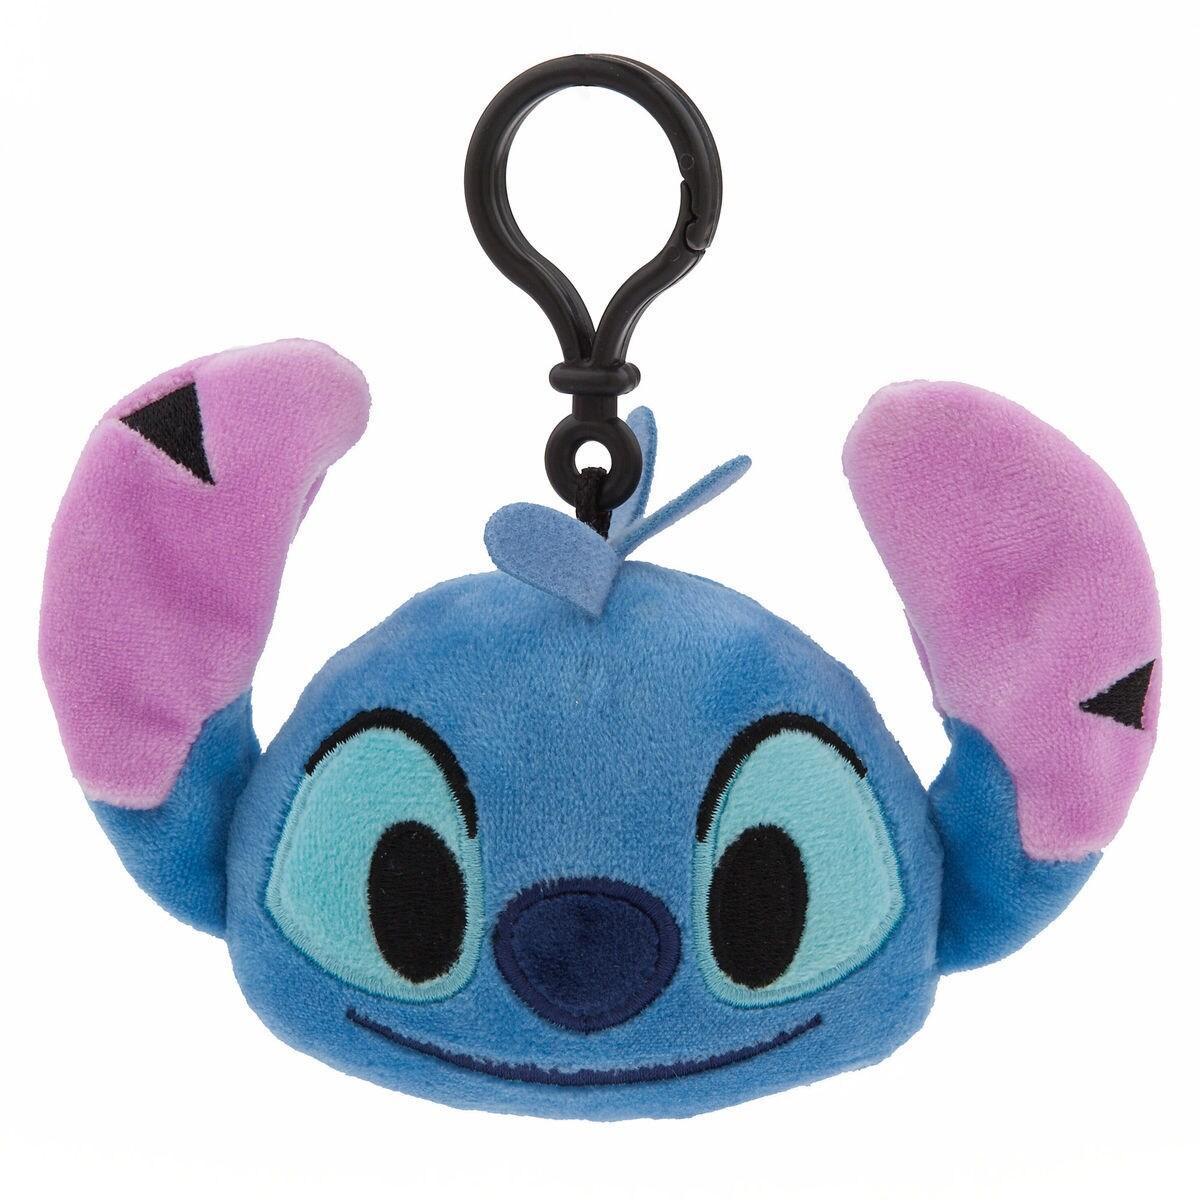 Stitch Emoji Plush Backpack Clip 4 Shopdisney